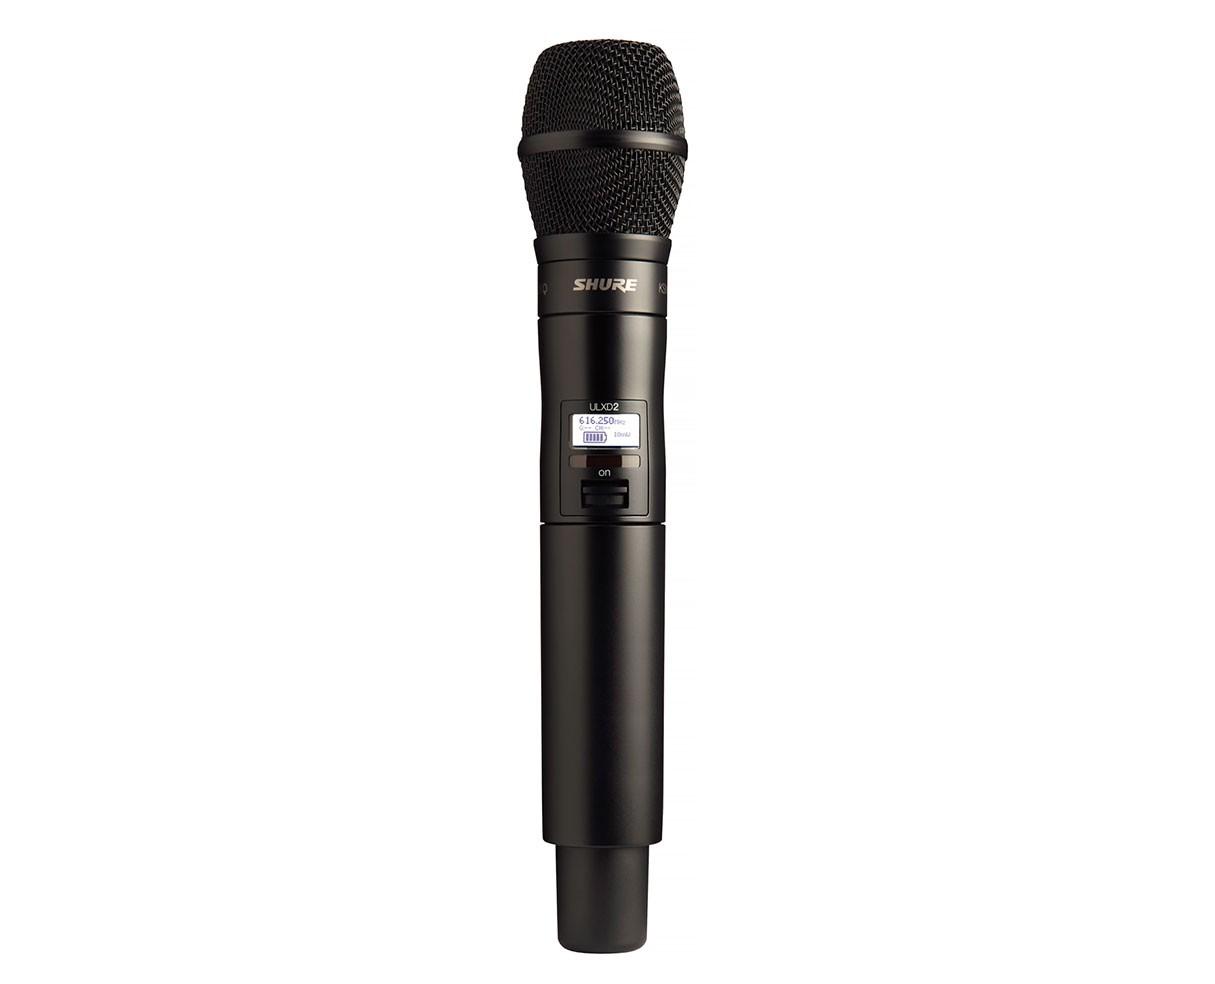 Shure ULXD2/KSM9HS (Band H50)